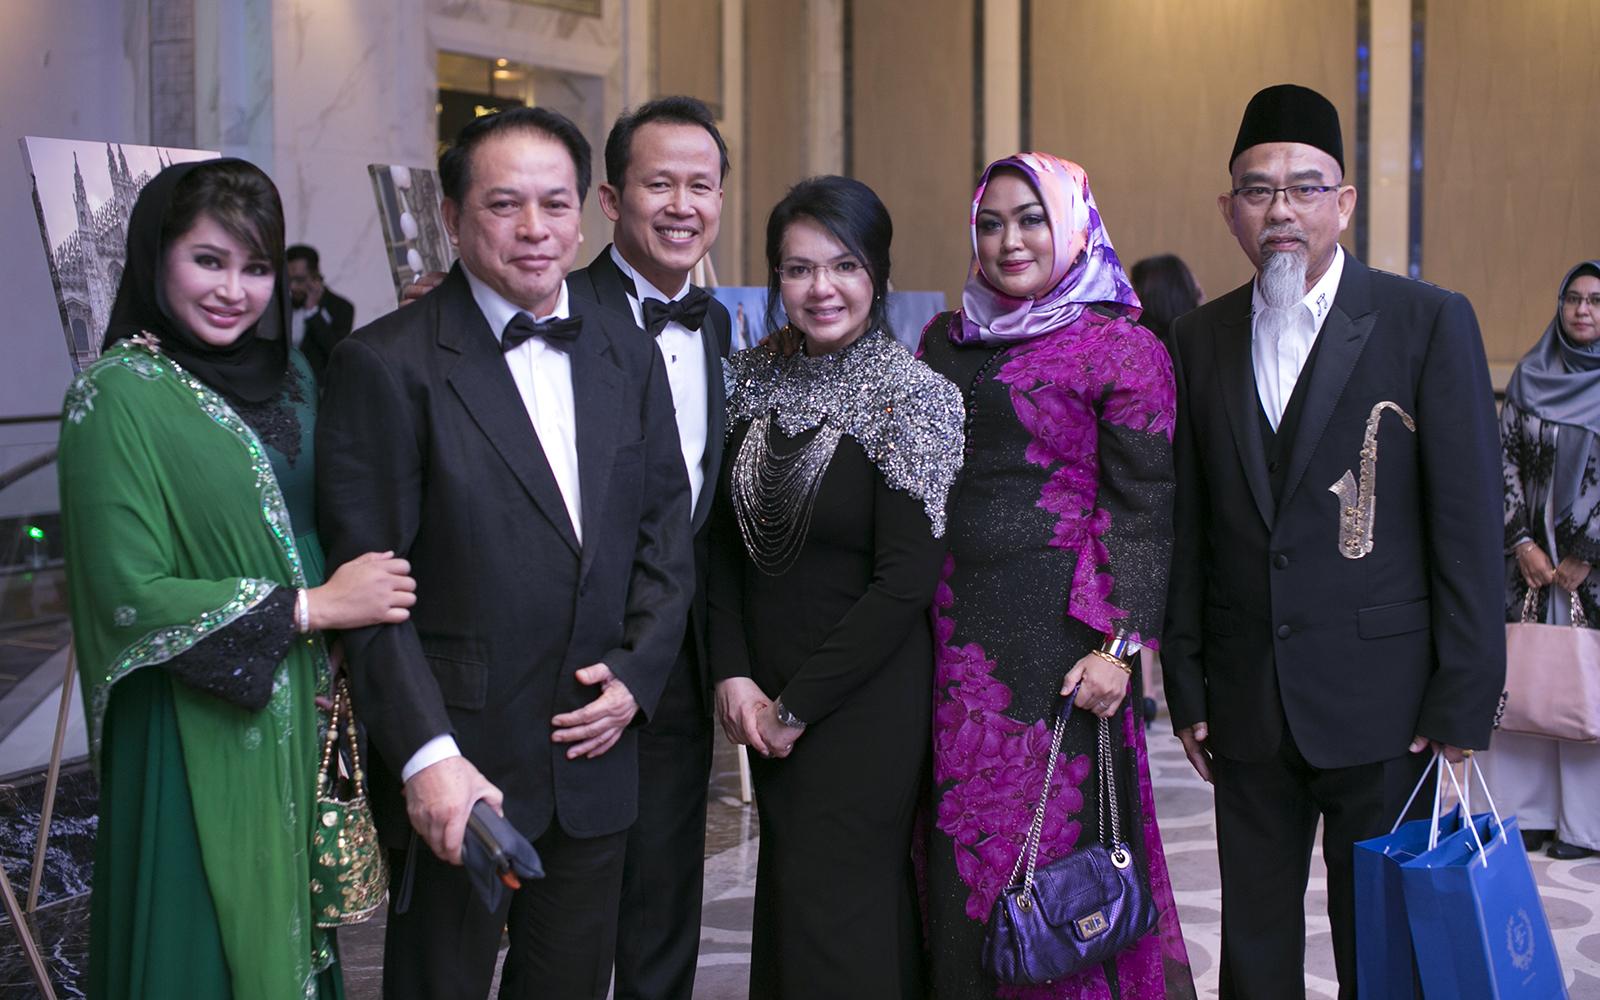 Puan Sri Nisa Bakri, Tan Sri Mohd Bakri Zinin, Dato' Abd Rashid Jabir, Dato' Farisah Mohd Farid, Datin Seri Nur Cahaya Ramlan and Dato' Seri Abd Majid Zainal Abidin